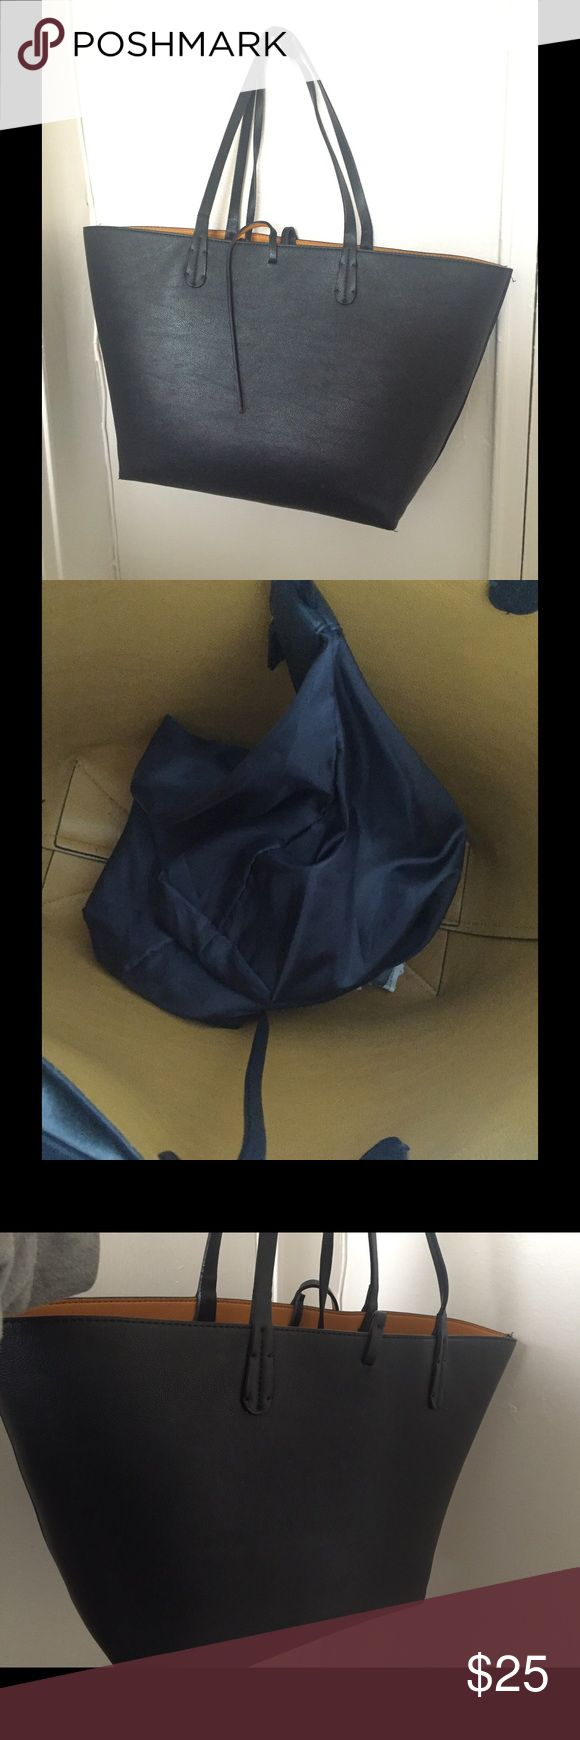 Zara tote bag Brand new bag , just a few pen marks inside Zara Bags Totes